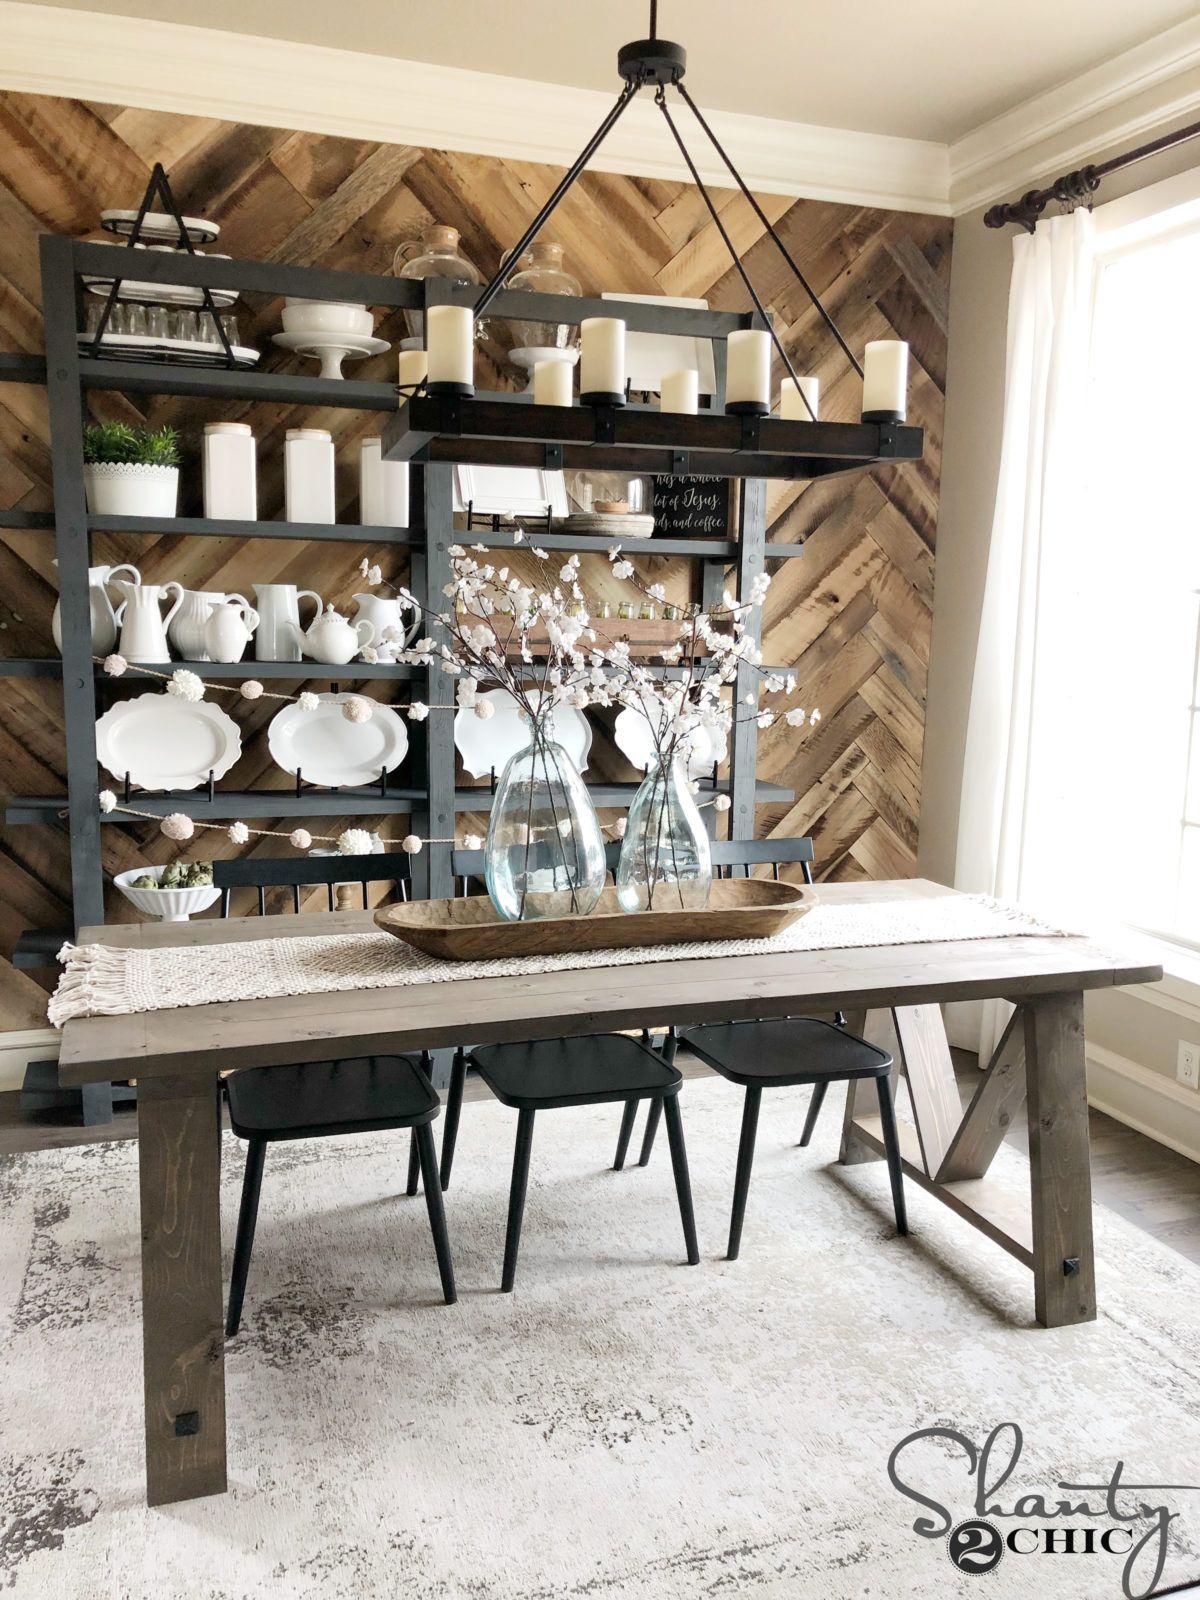 Diy Fancy V Dining Table For Under 100 Diy Dining Table Dining Table Diy Farmhouse Table